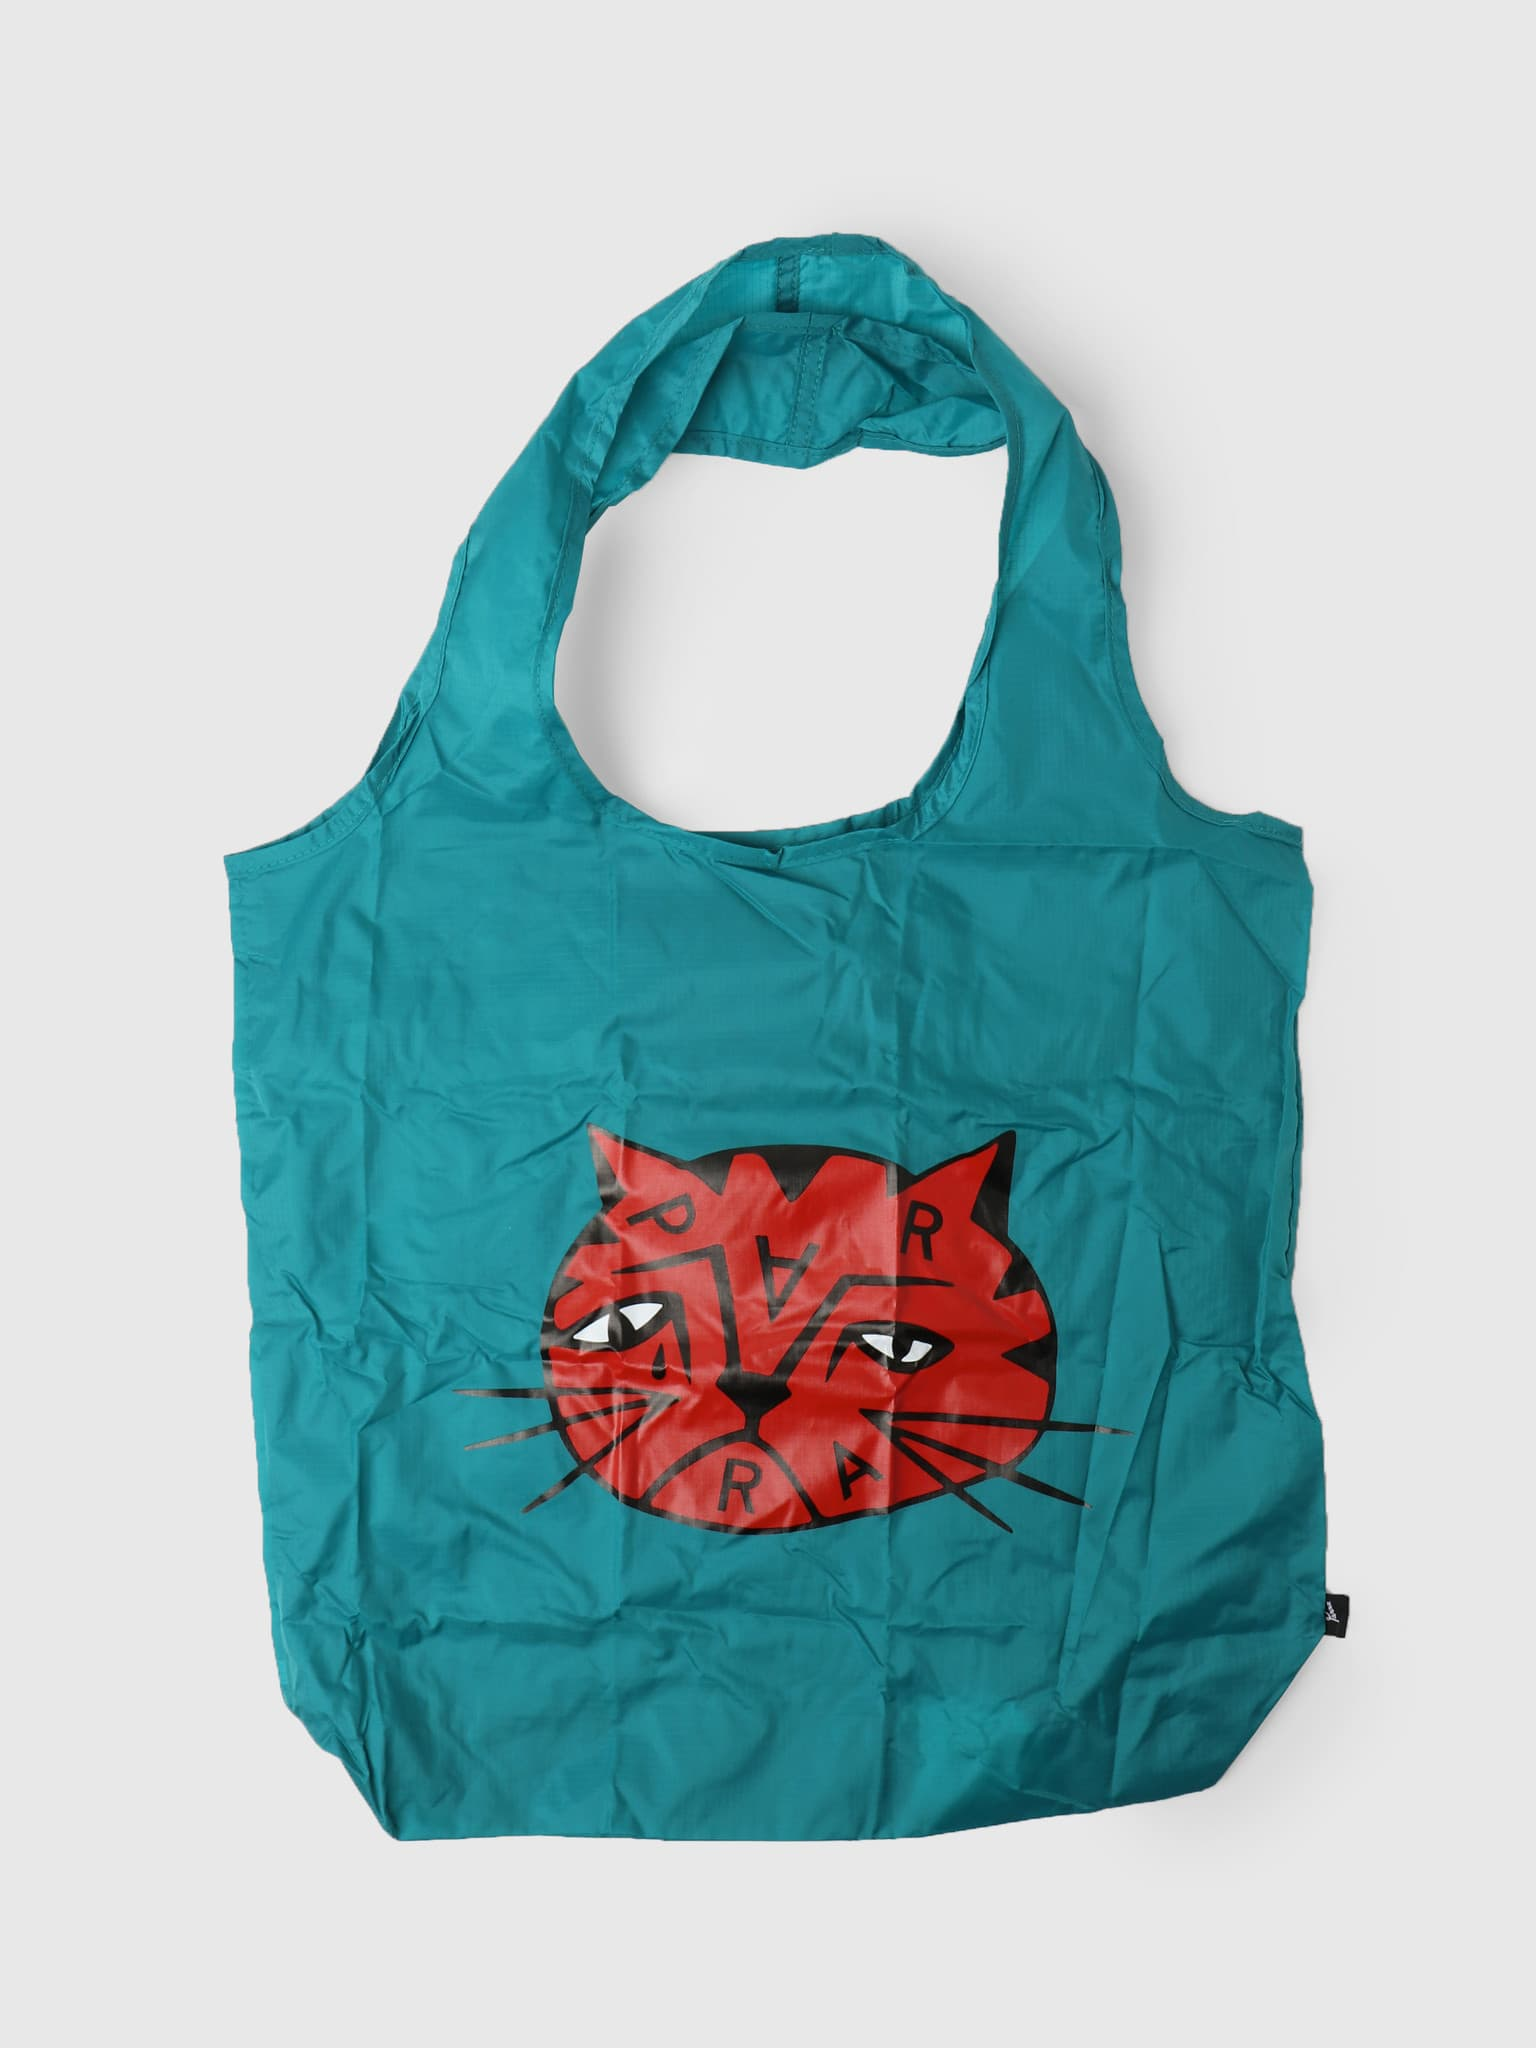 Sad Cat Tote Bag Dusty Blue 46140